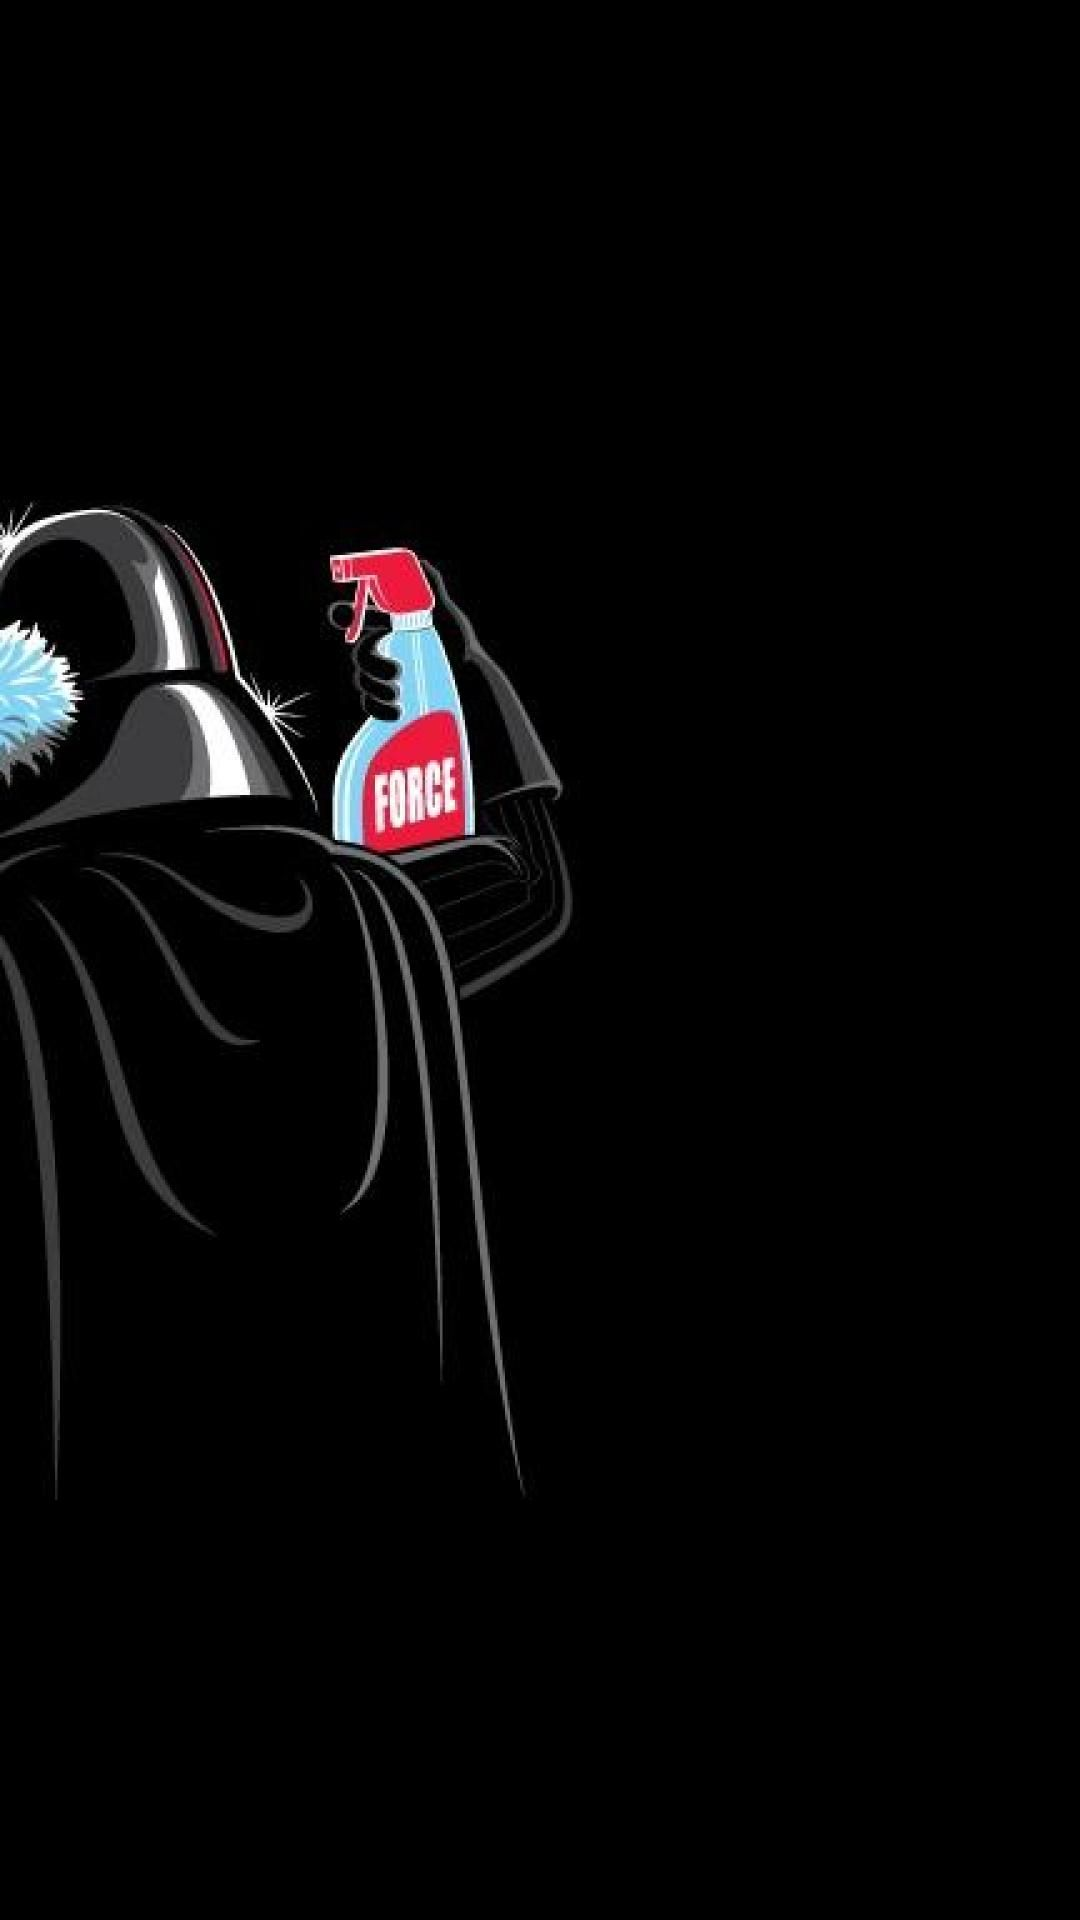 Star Wars Funny Wallpaper Posted By Samantha Tremblay